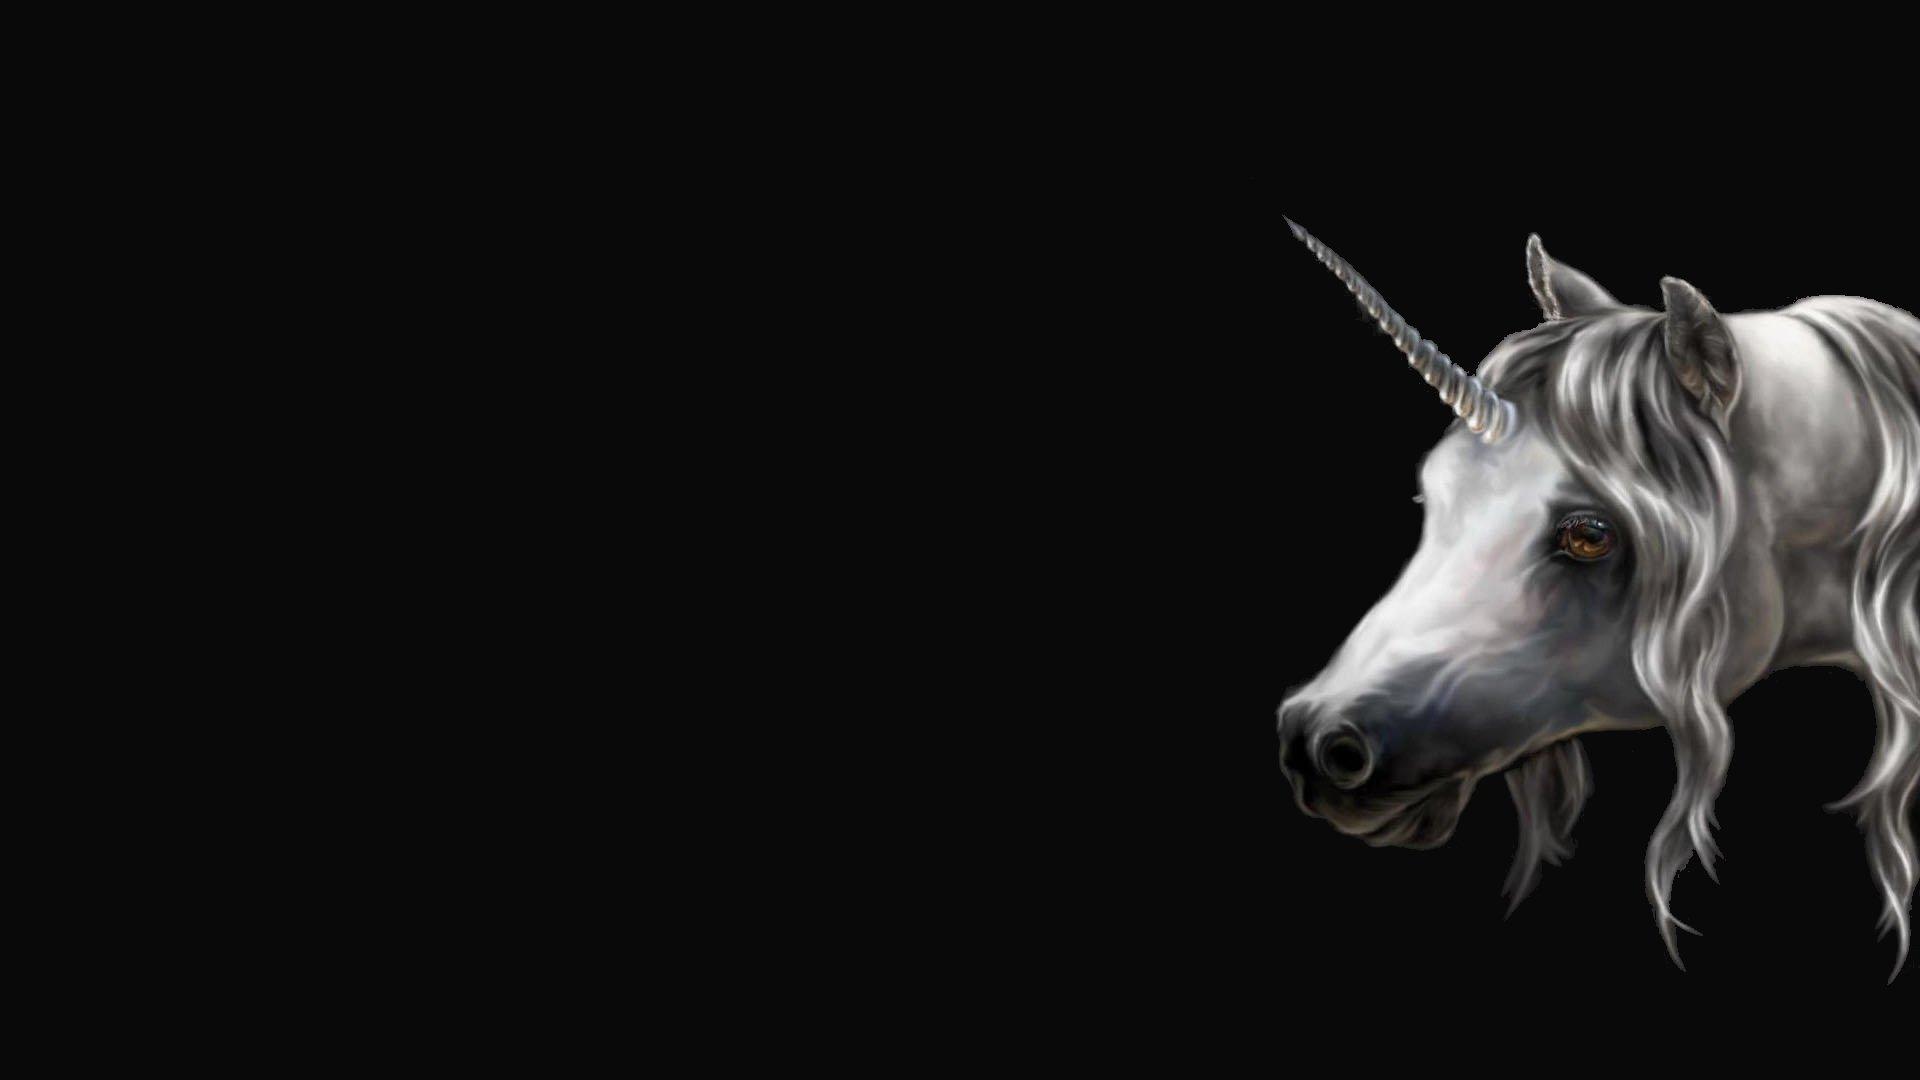 Download Black Unicorn Wallpaper Hd Backgrounds Download